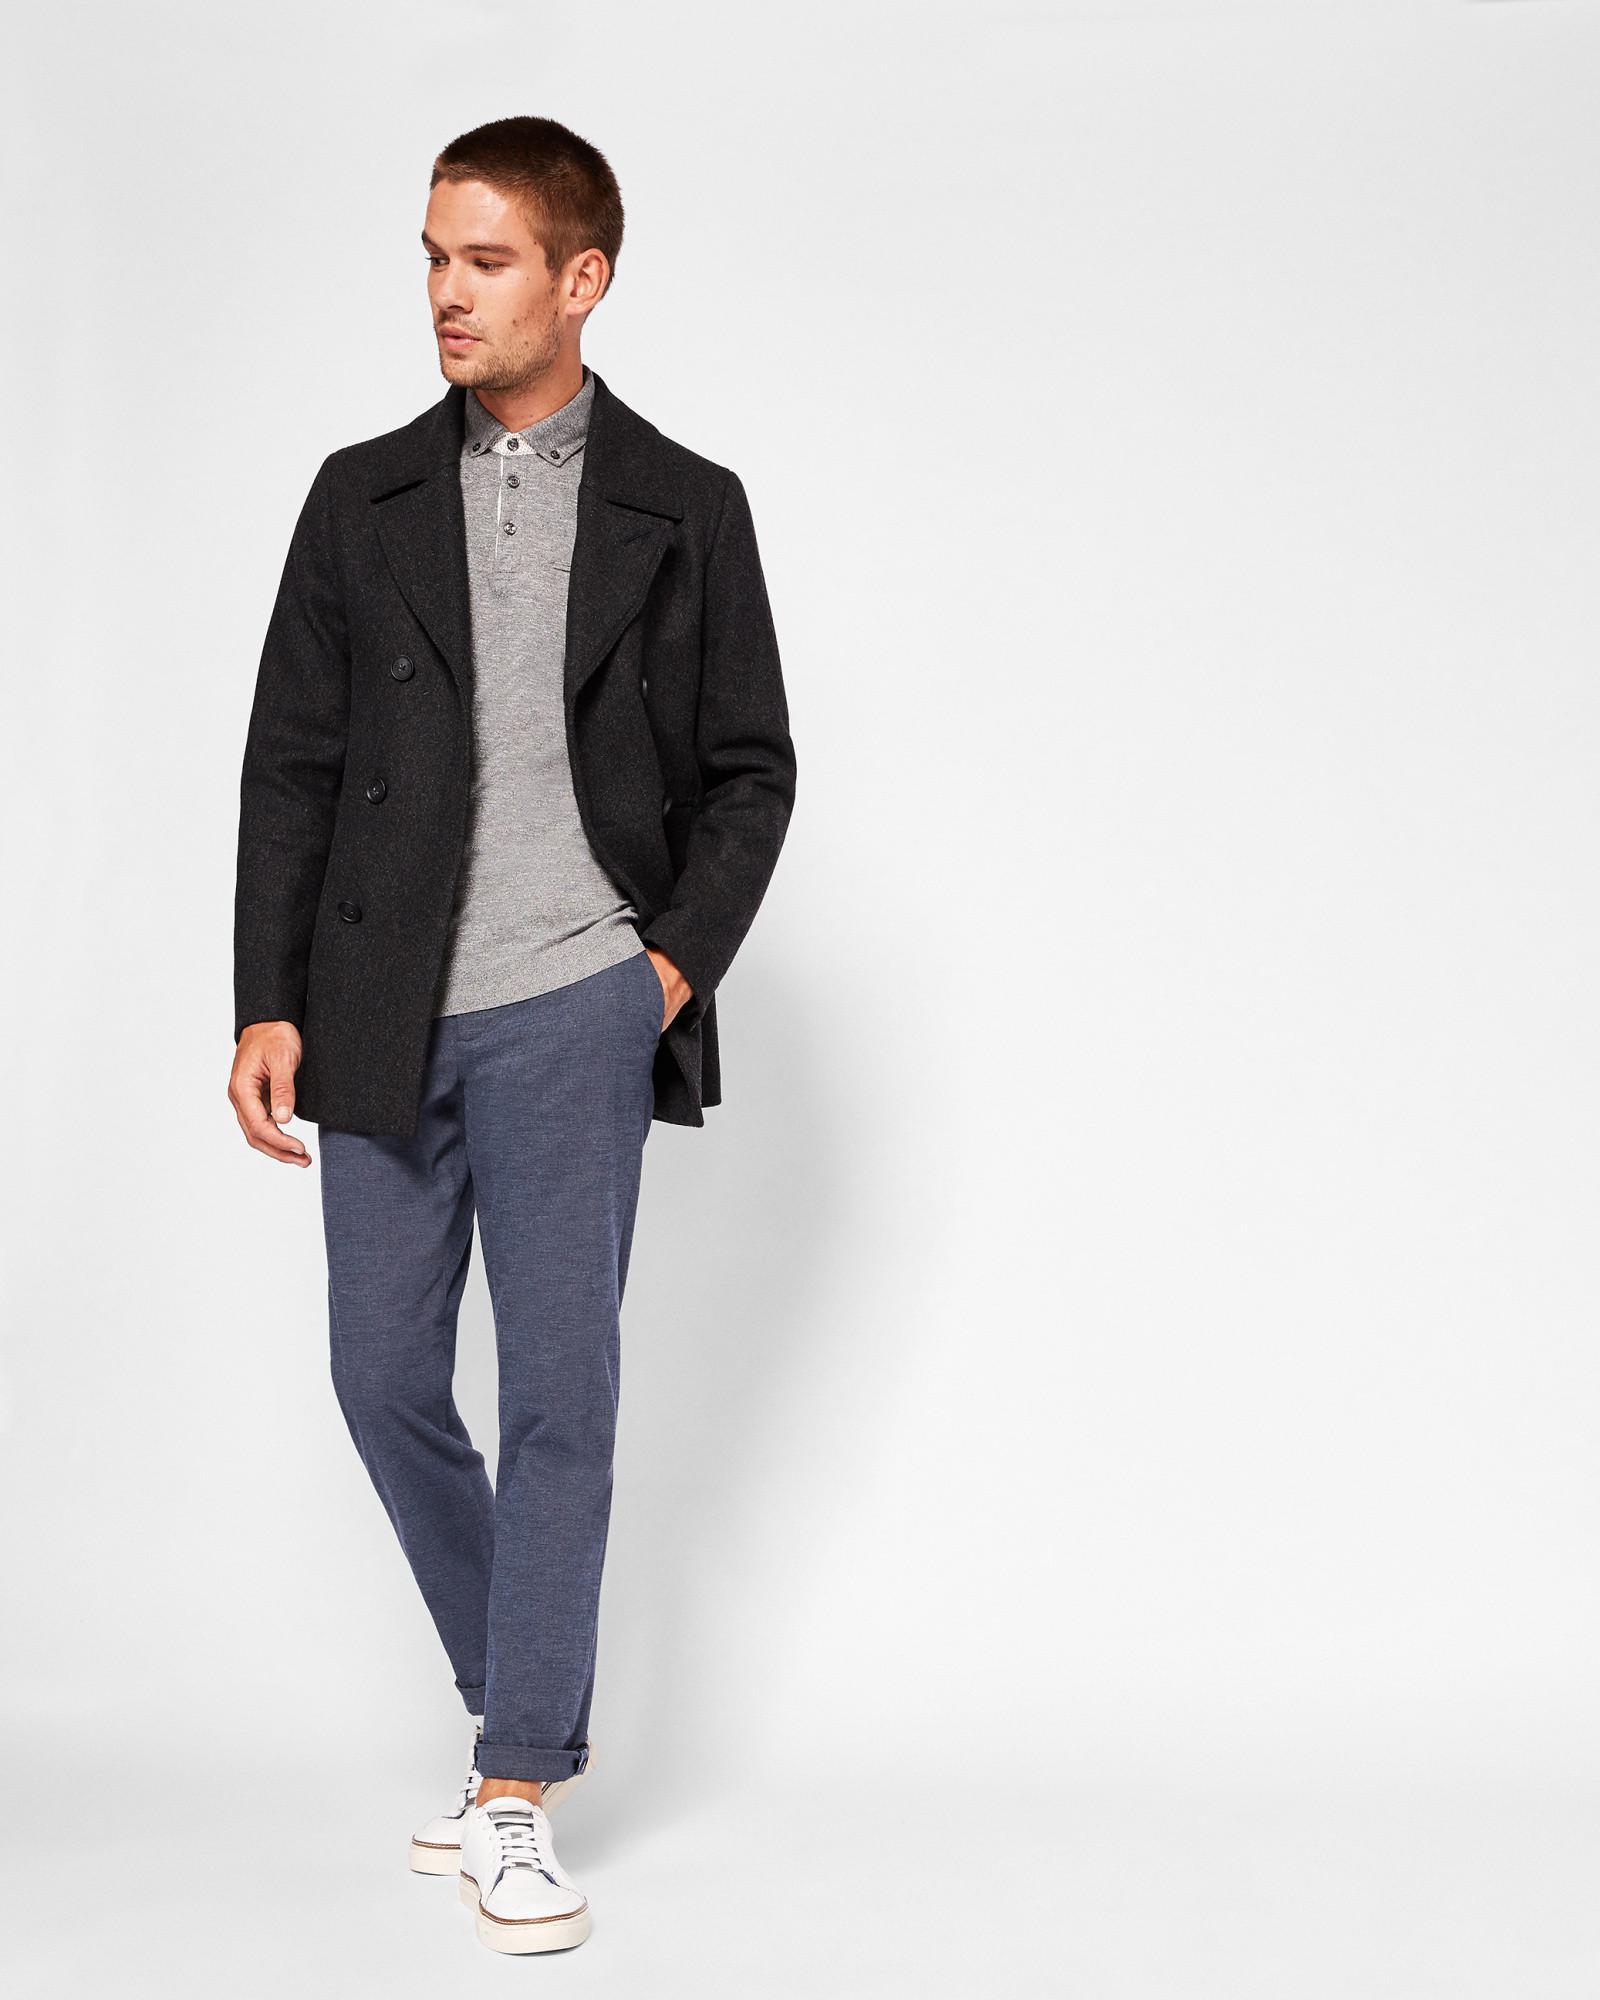 7b9fd8c520ee7f Ted Baker Wool Peacoat in Gray for Men - Lyst